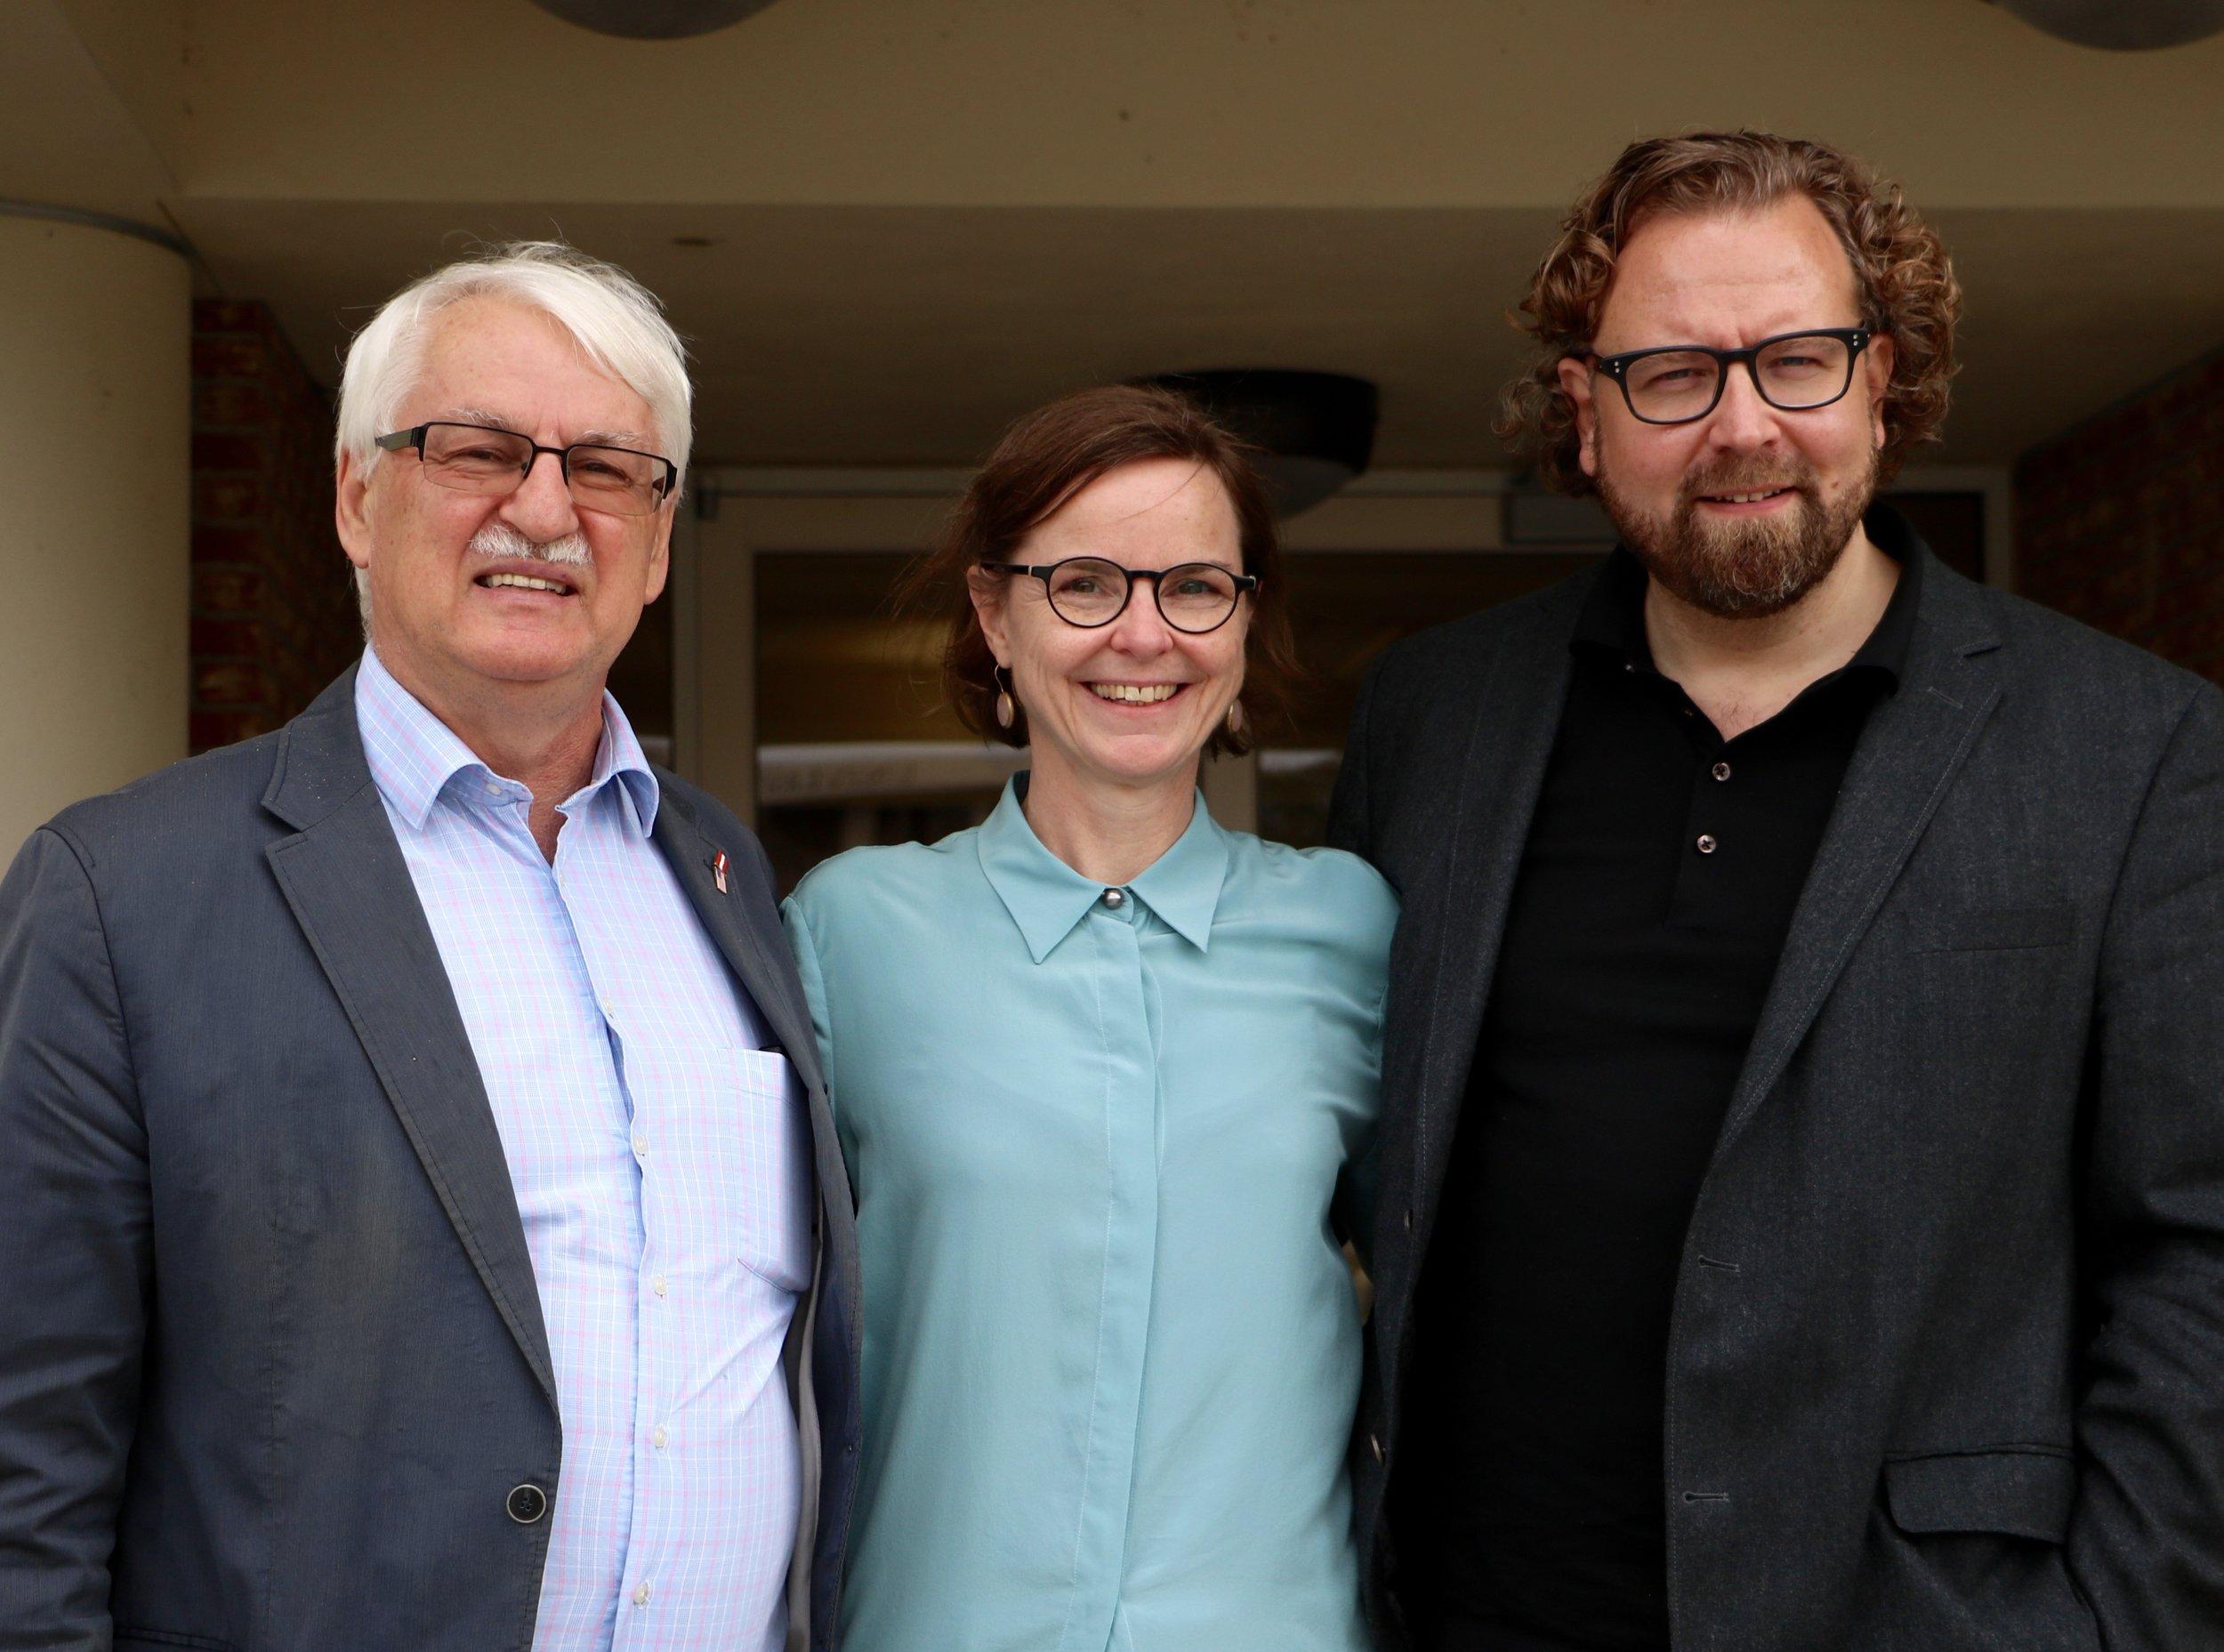 From left: Günter Bischof, Director, Doris Eibl, Visiting Professor at UNO, Dirk Rupnow, guest lecturer. Photo: Theresa Peischer